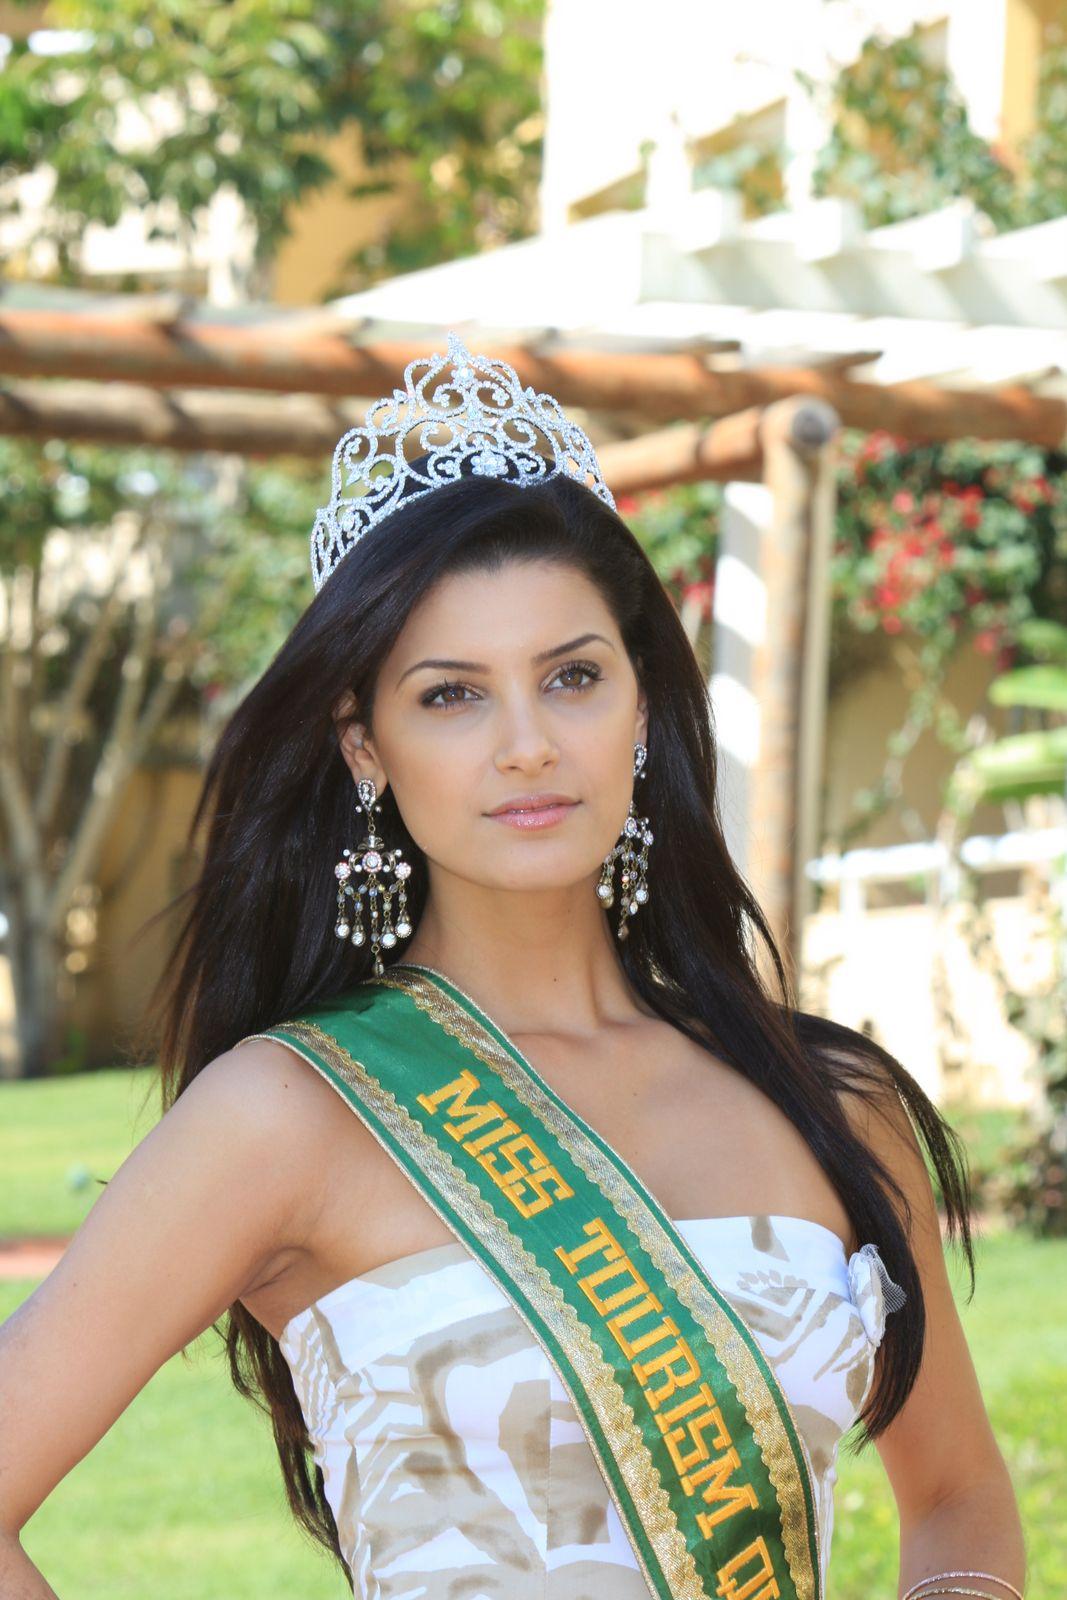 vivian noronha, rainha hispanoamericana 2008. suplente. - Página 4 Flqb3v4n